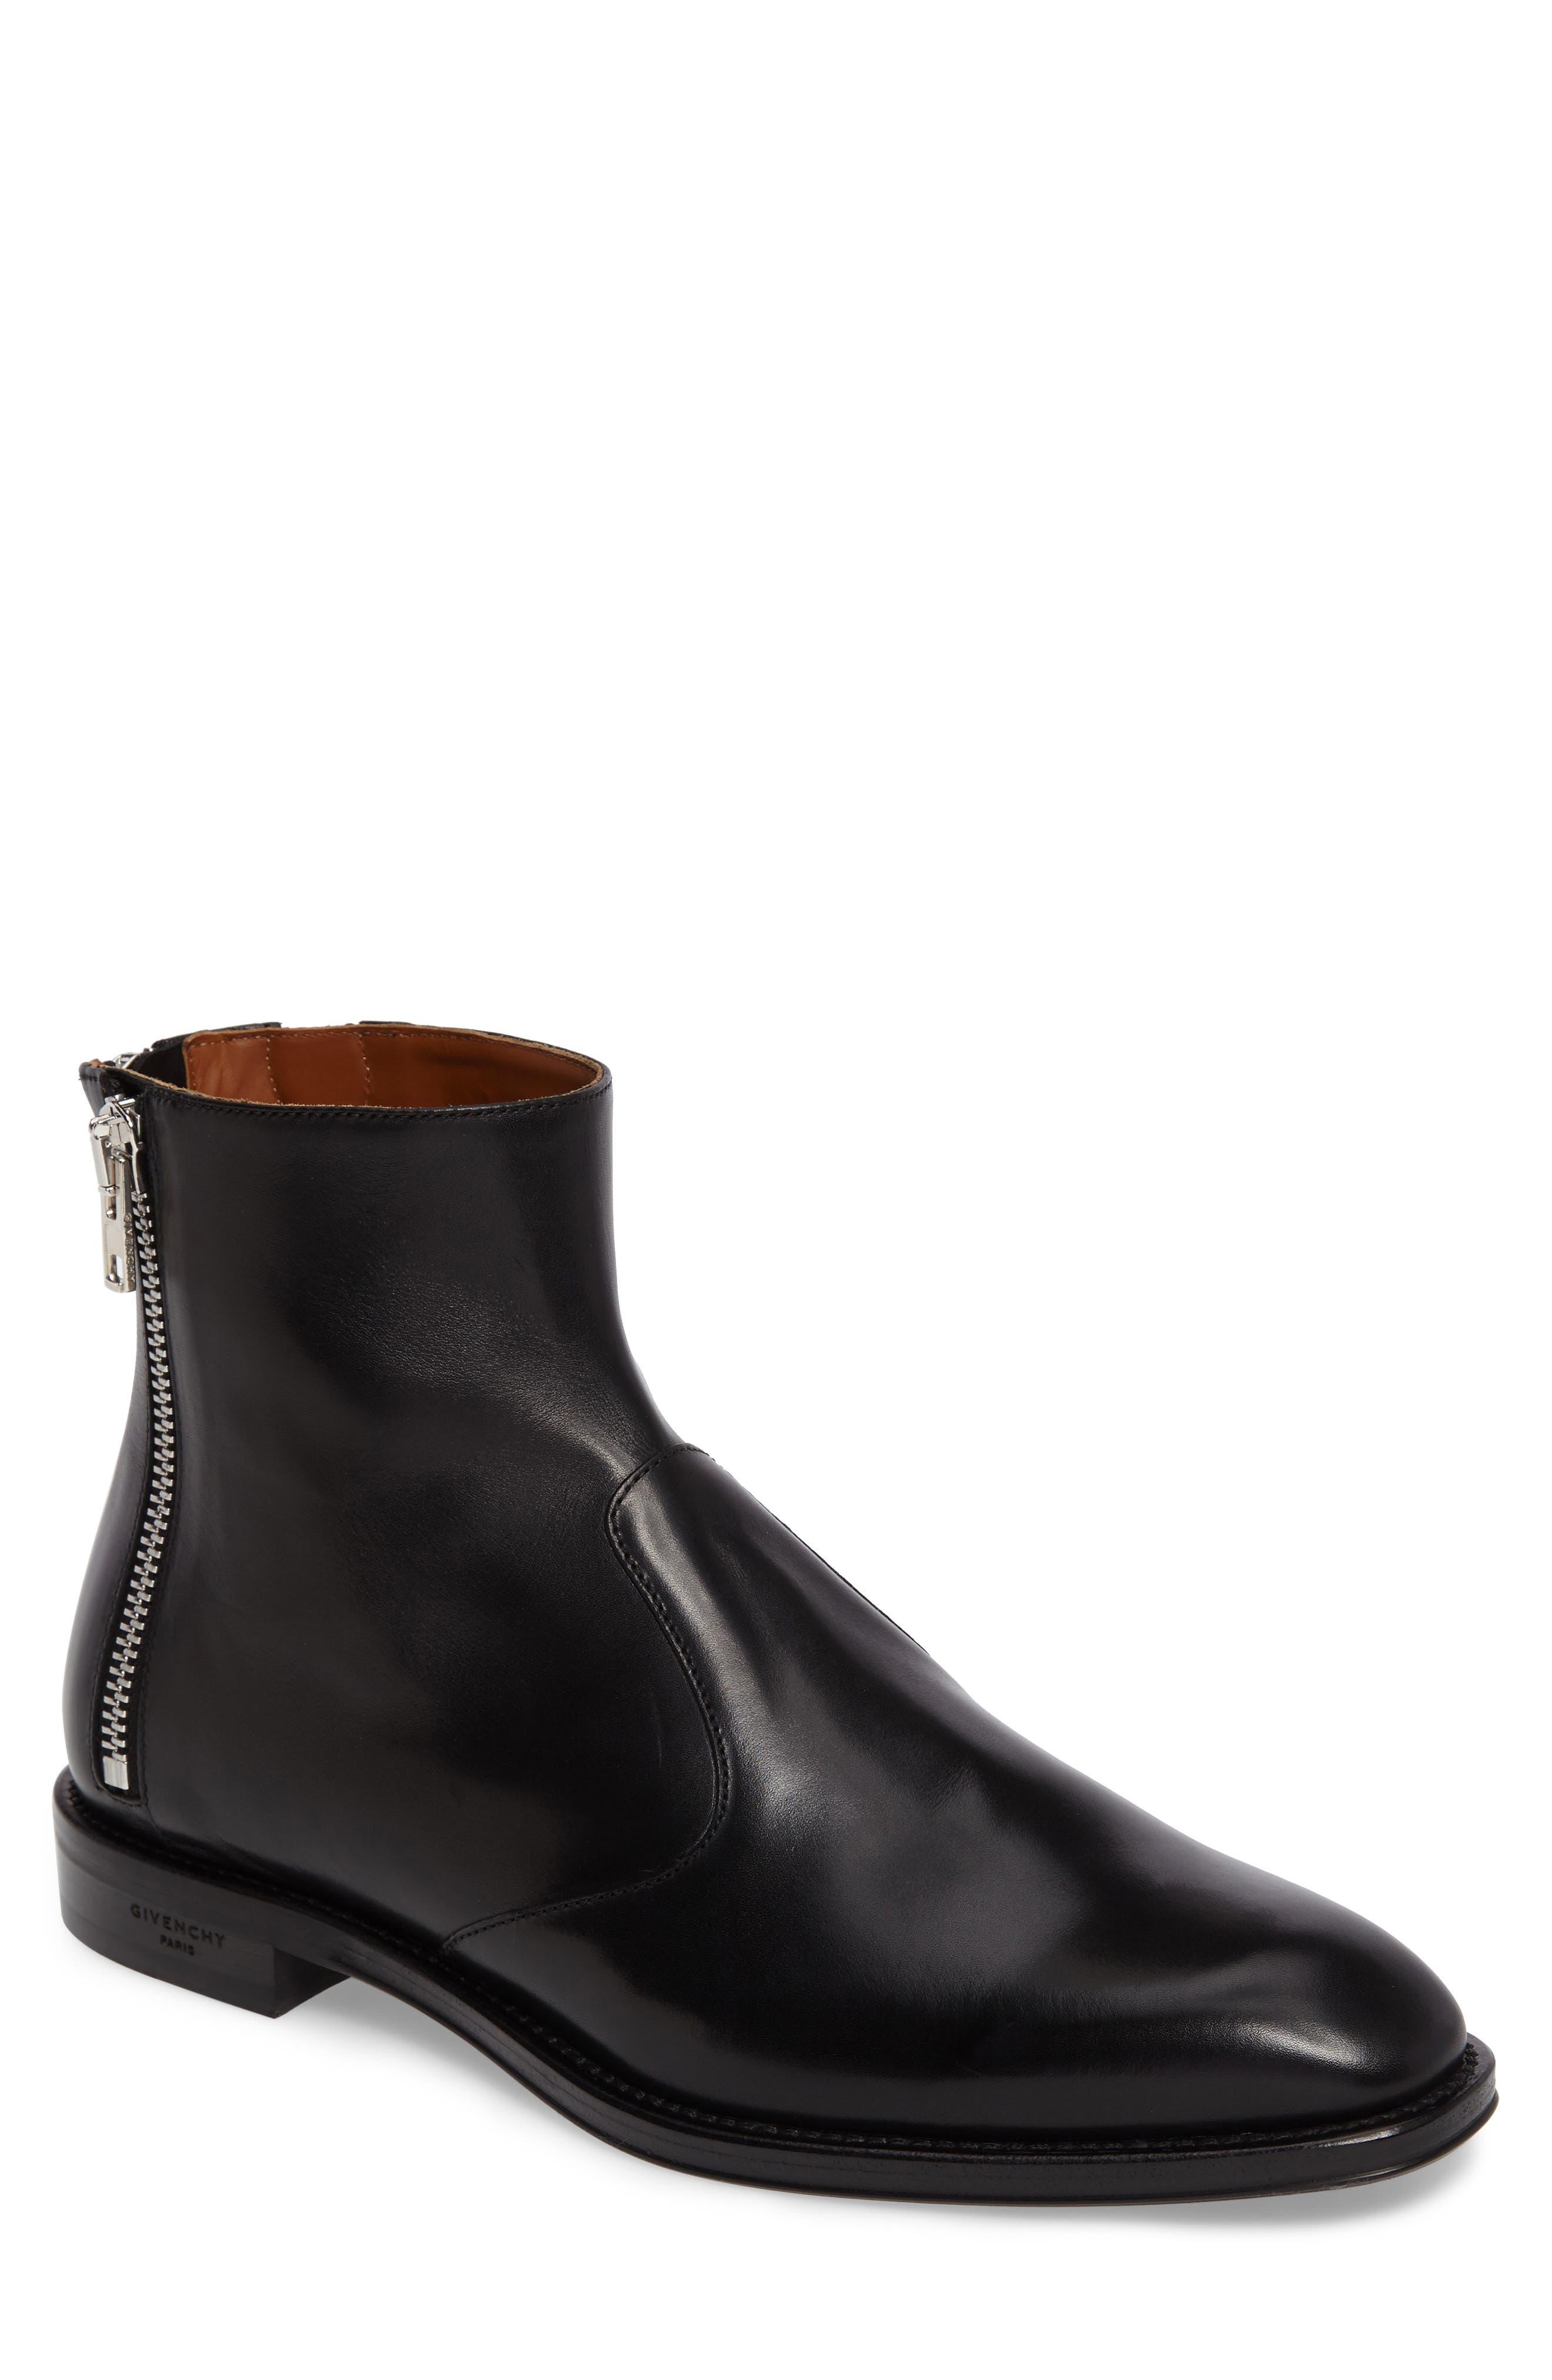 Main Image - Givenchy Three-Zipper Boot (Men)